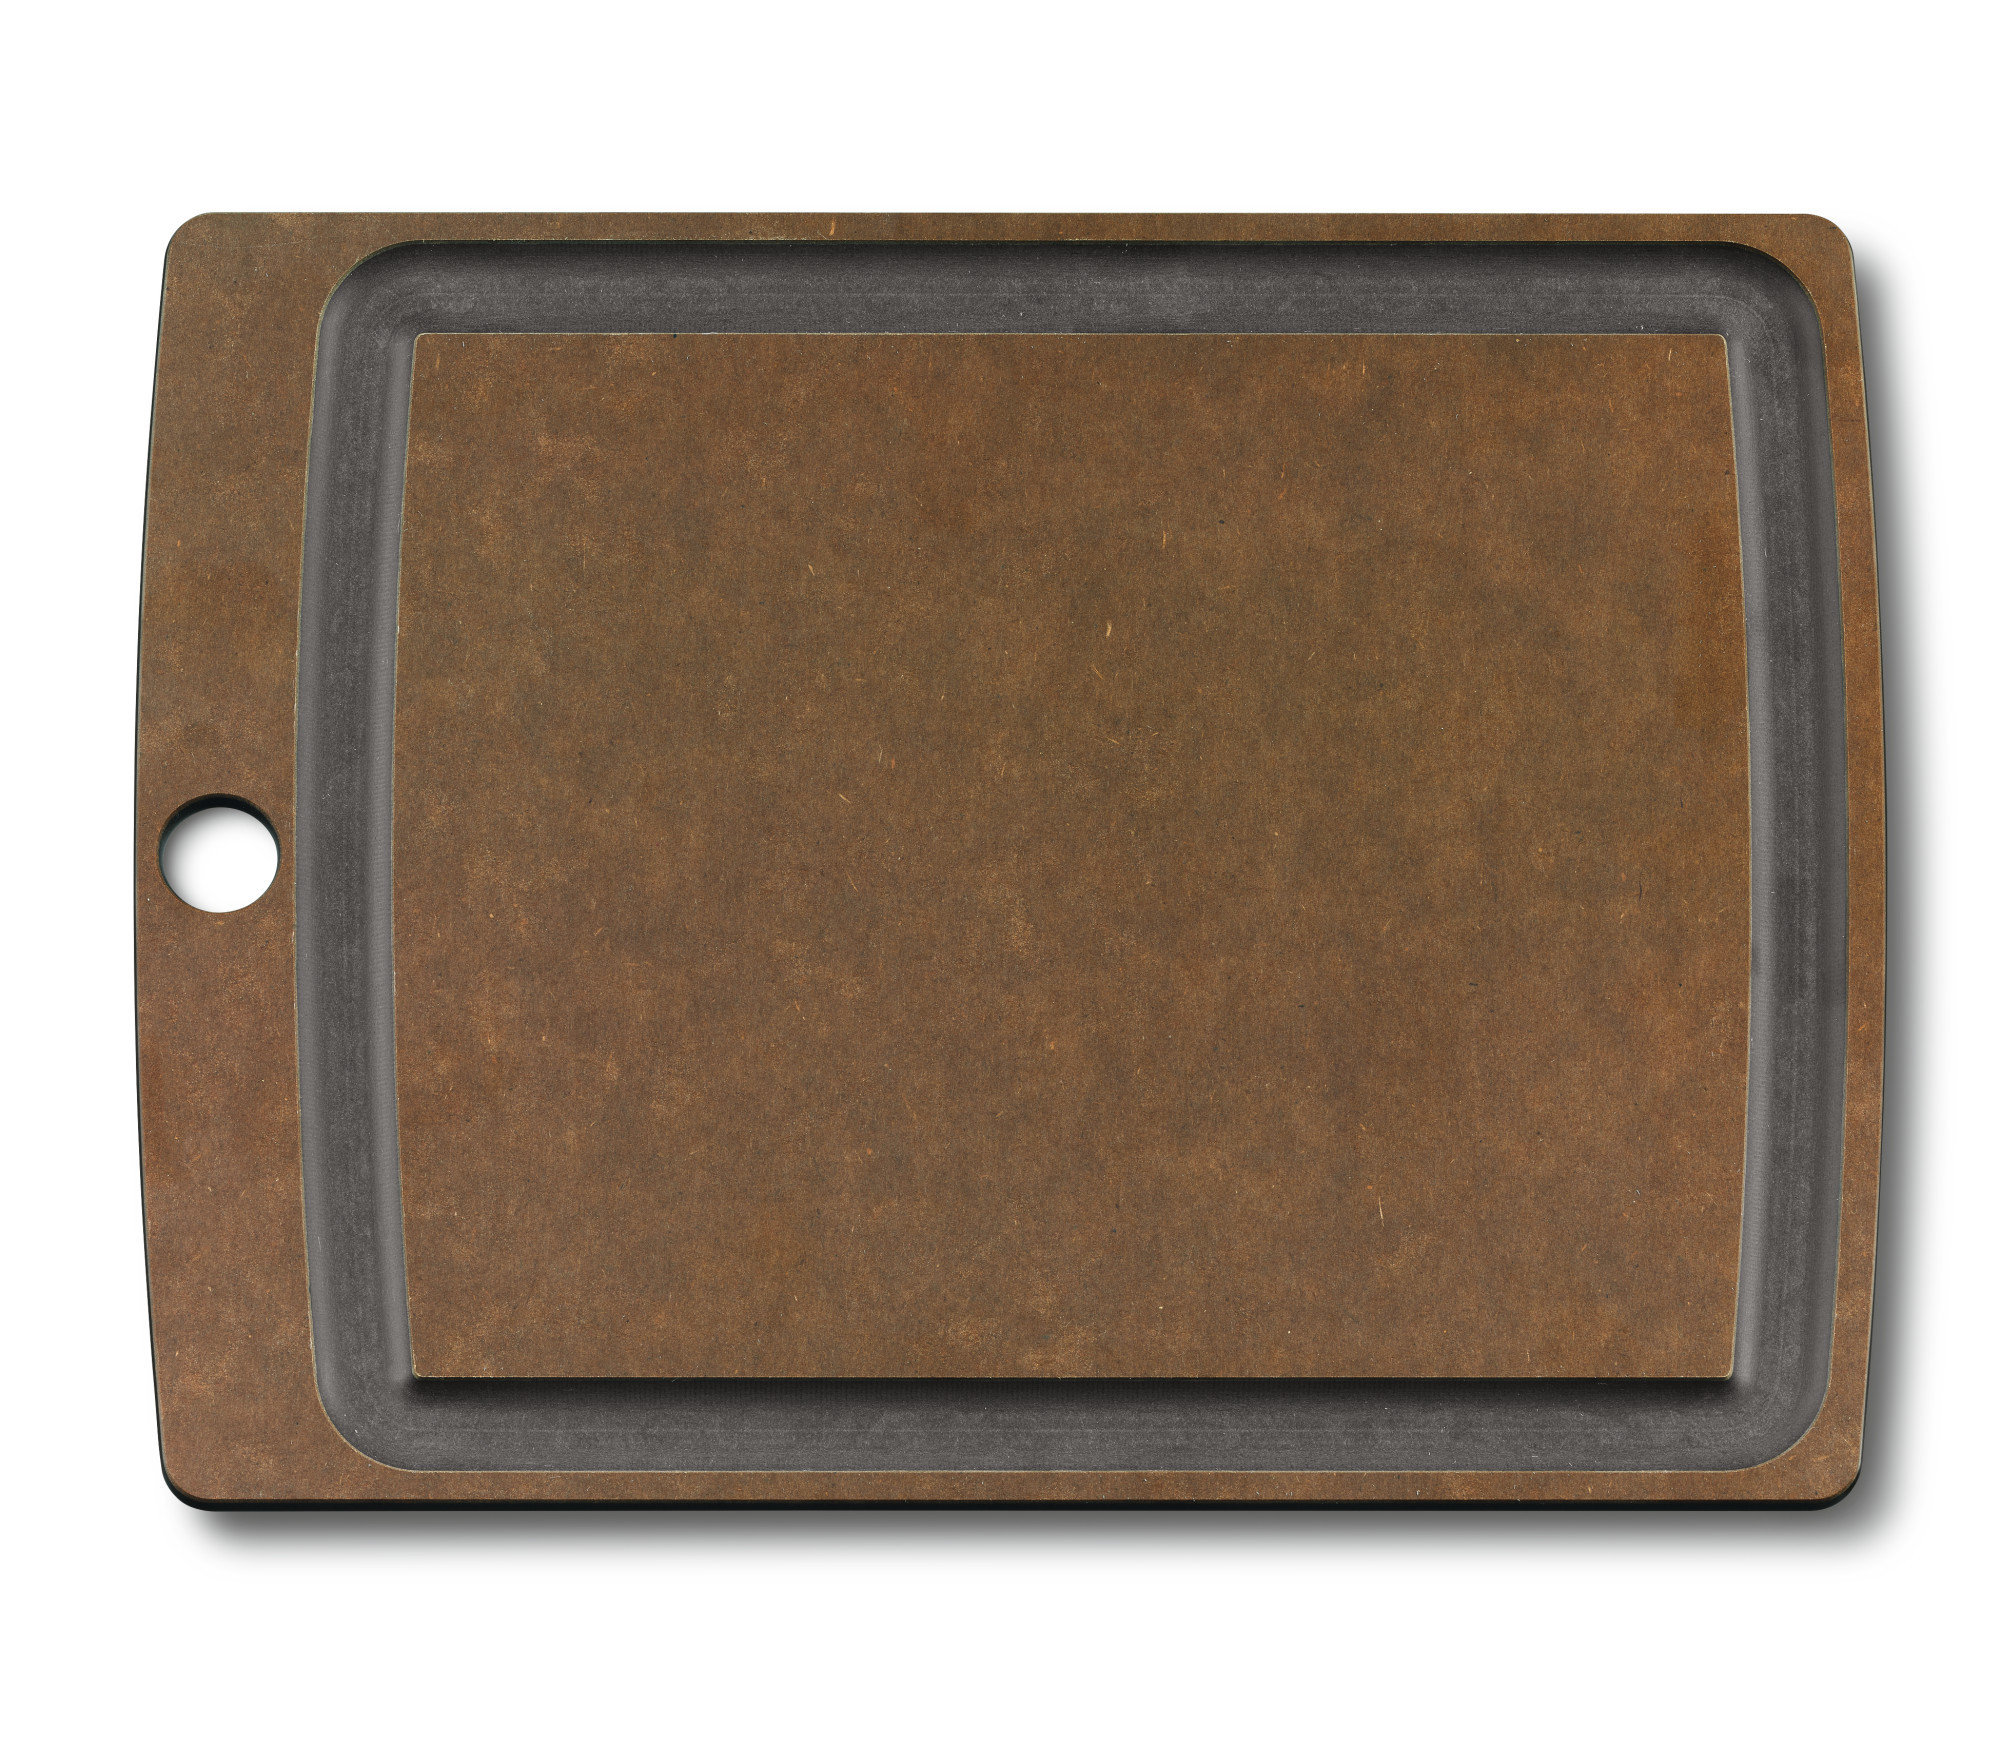 Разделочная доска Victorinox M (7.4112) размер 292x229x7 мм., цвет коричневый